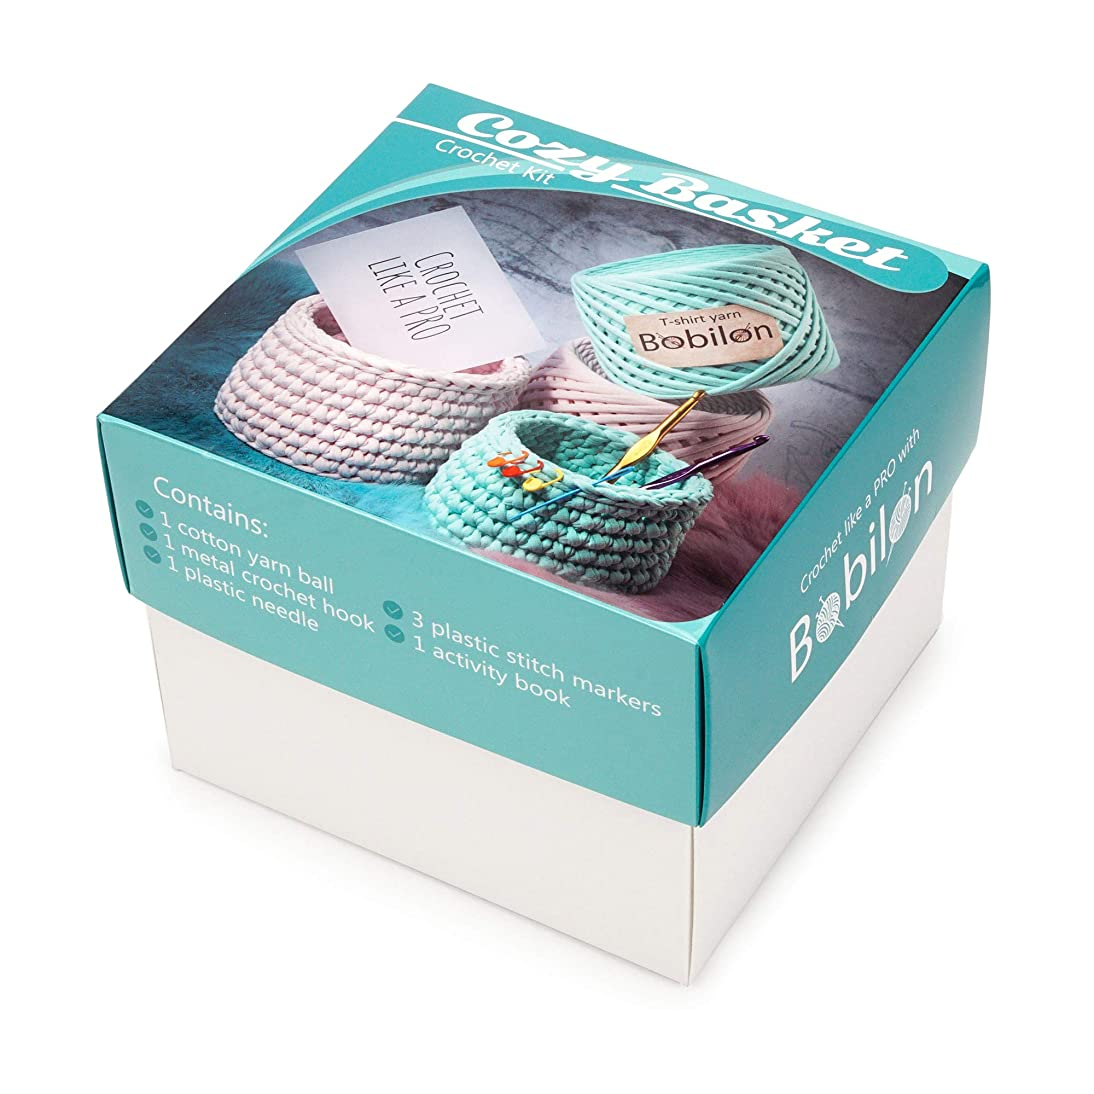 T-Shirt Yarn Fettuccini Zpagetti Set - Cozy Basket Crochet Kit - Tshirt Yarn for Crocheting - Ribbon Yarn 100% Cotton - DIY Kit with Yarn Tools - T Yarn Organic - T-Yarn Mint